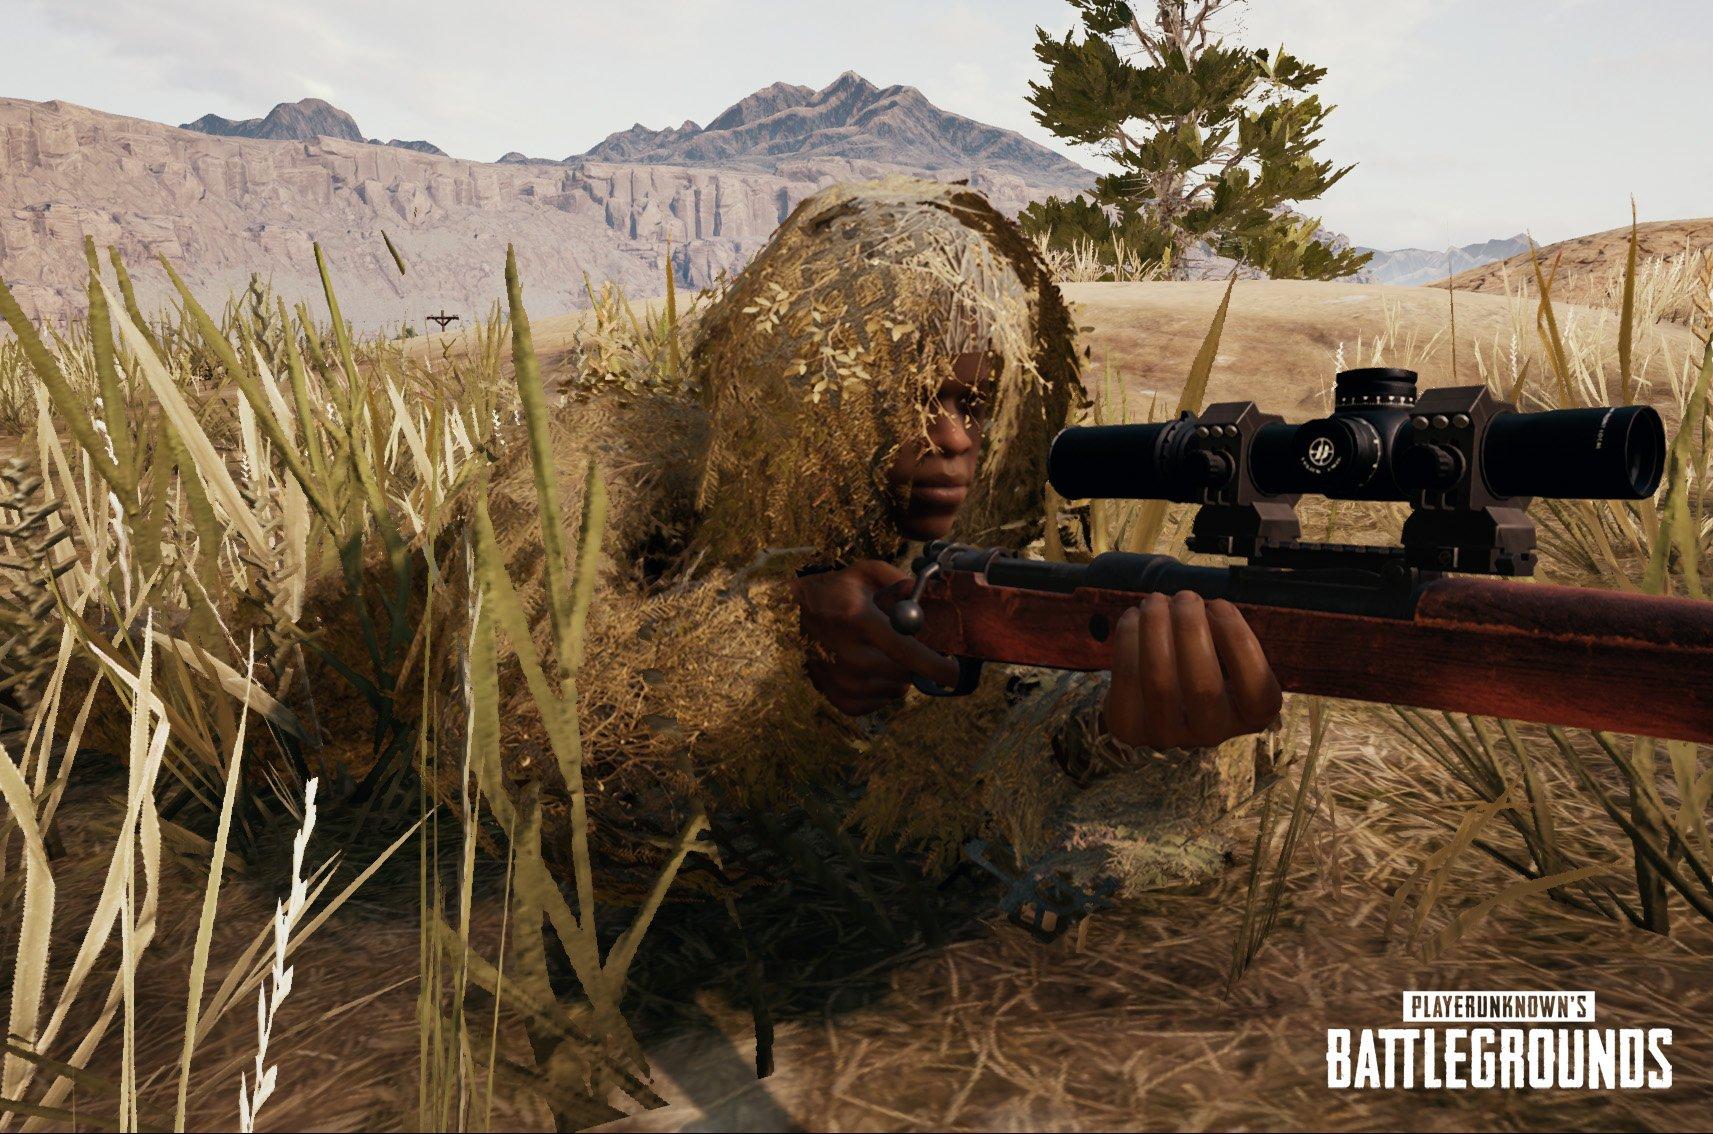 Pubg Wallpaper Ghillie Suit: PlayerUnknown's Battlegrounds Miramar Desert Map Now